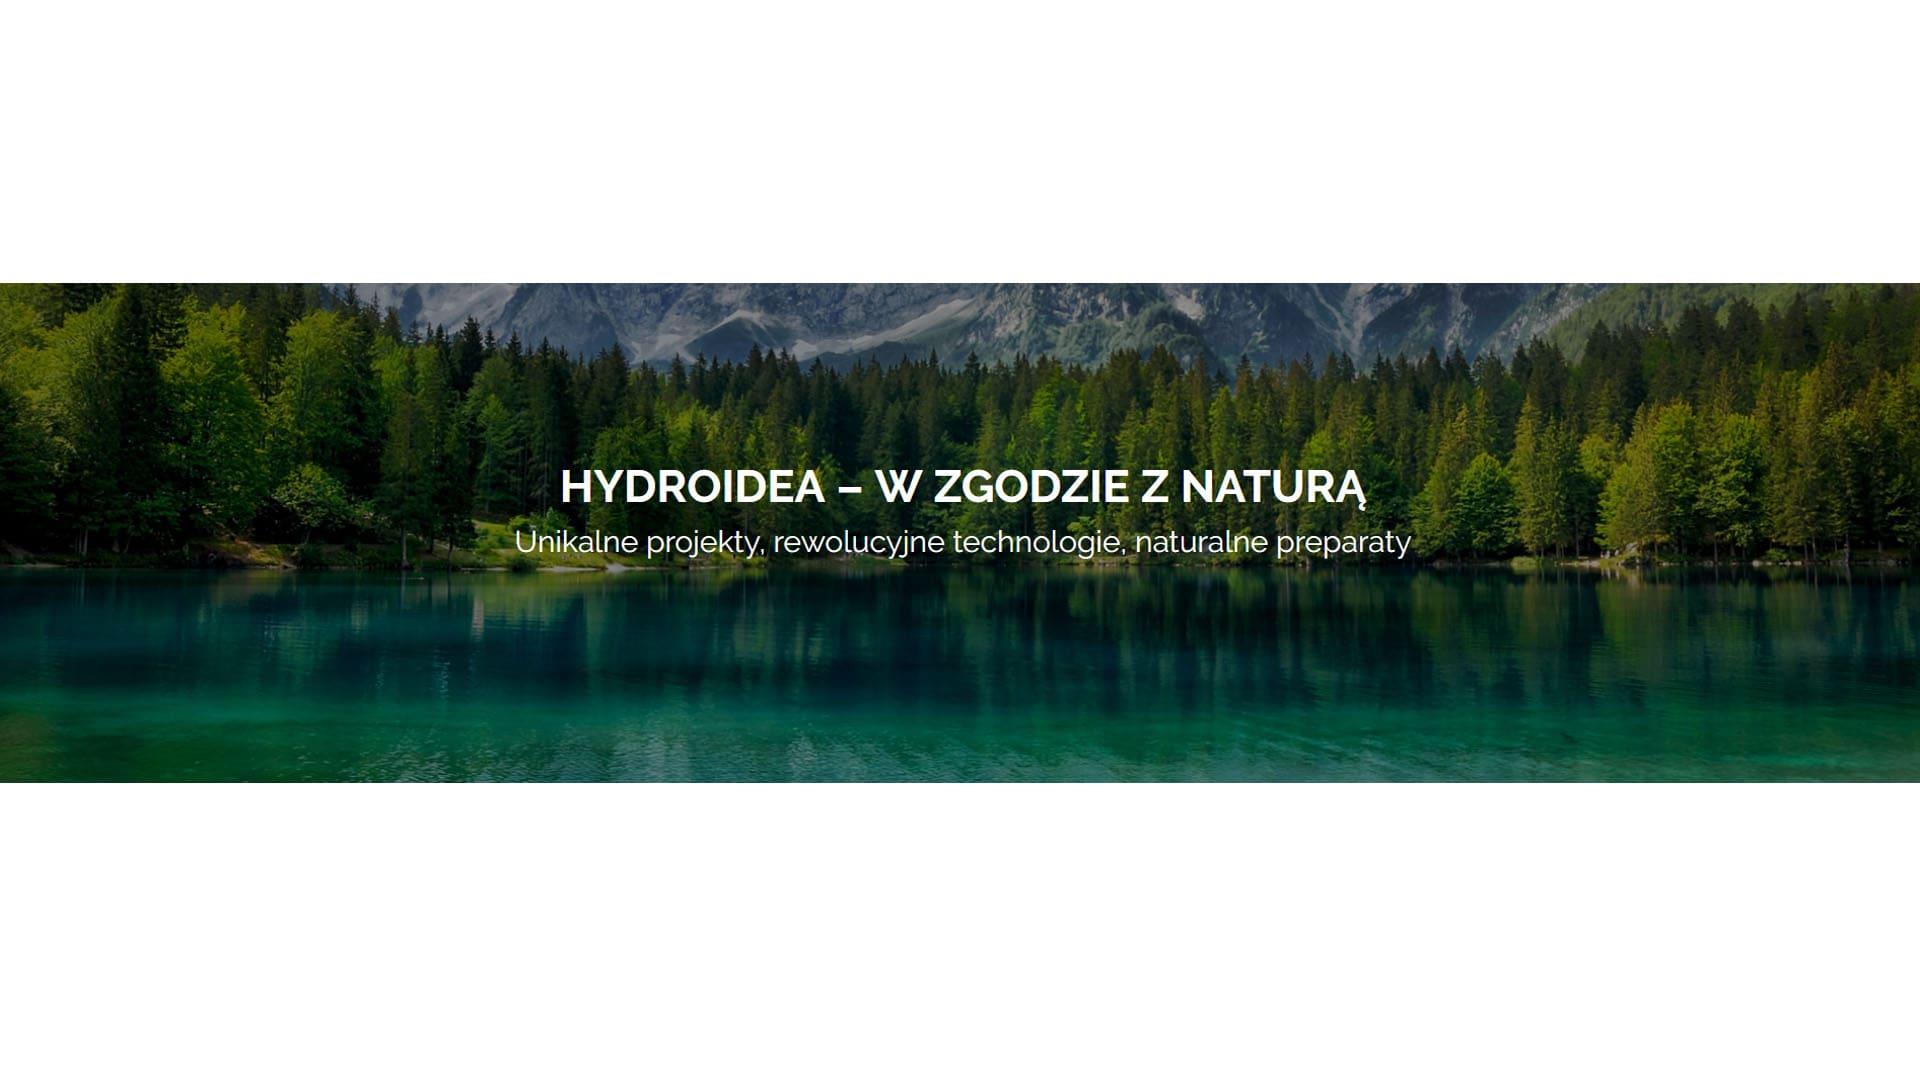 hydroidea.jpg